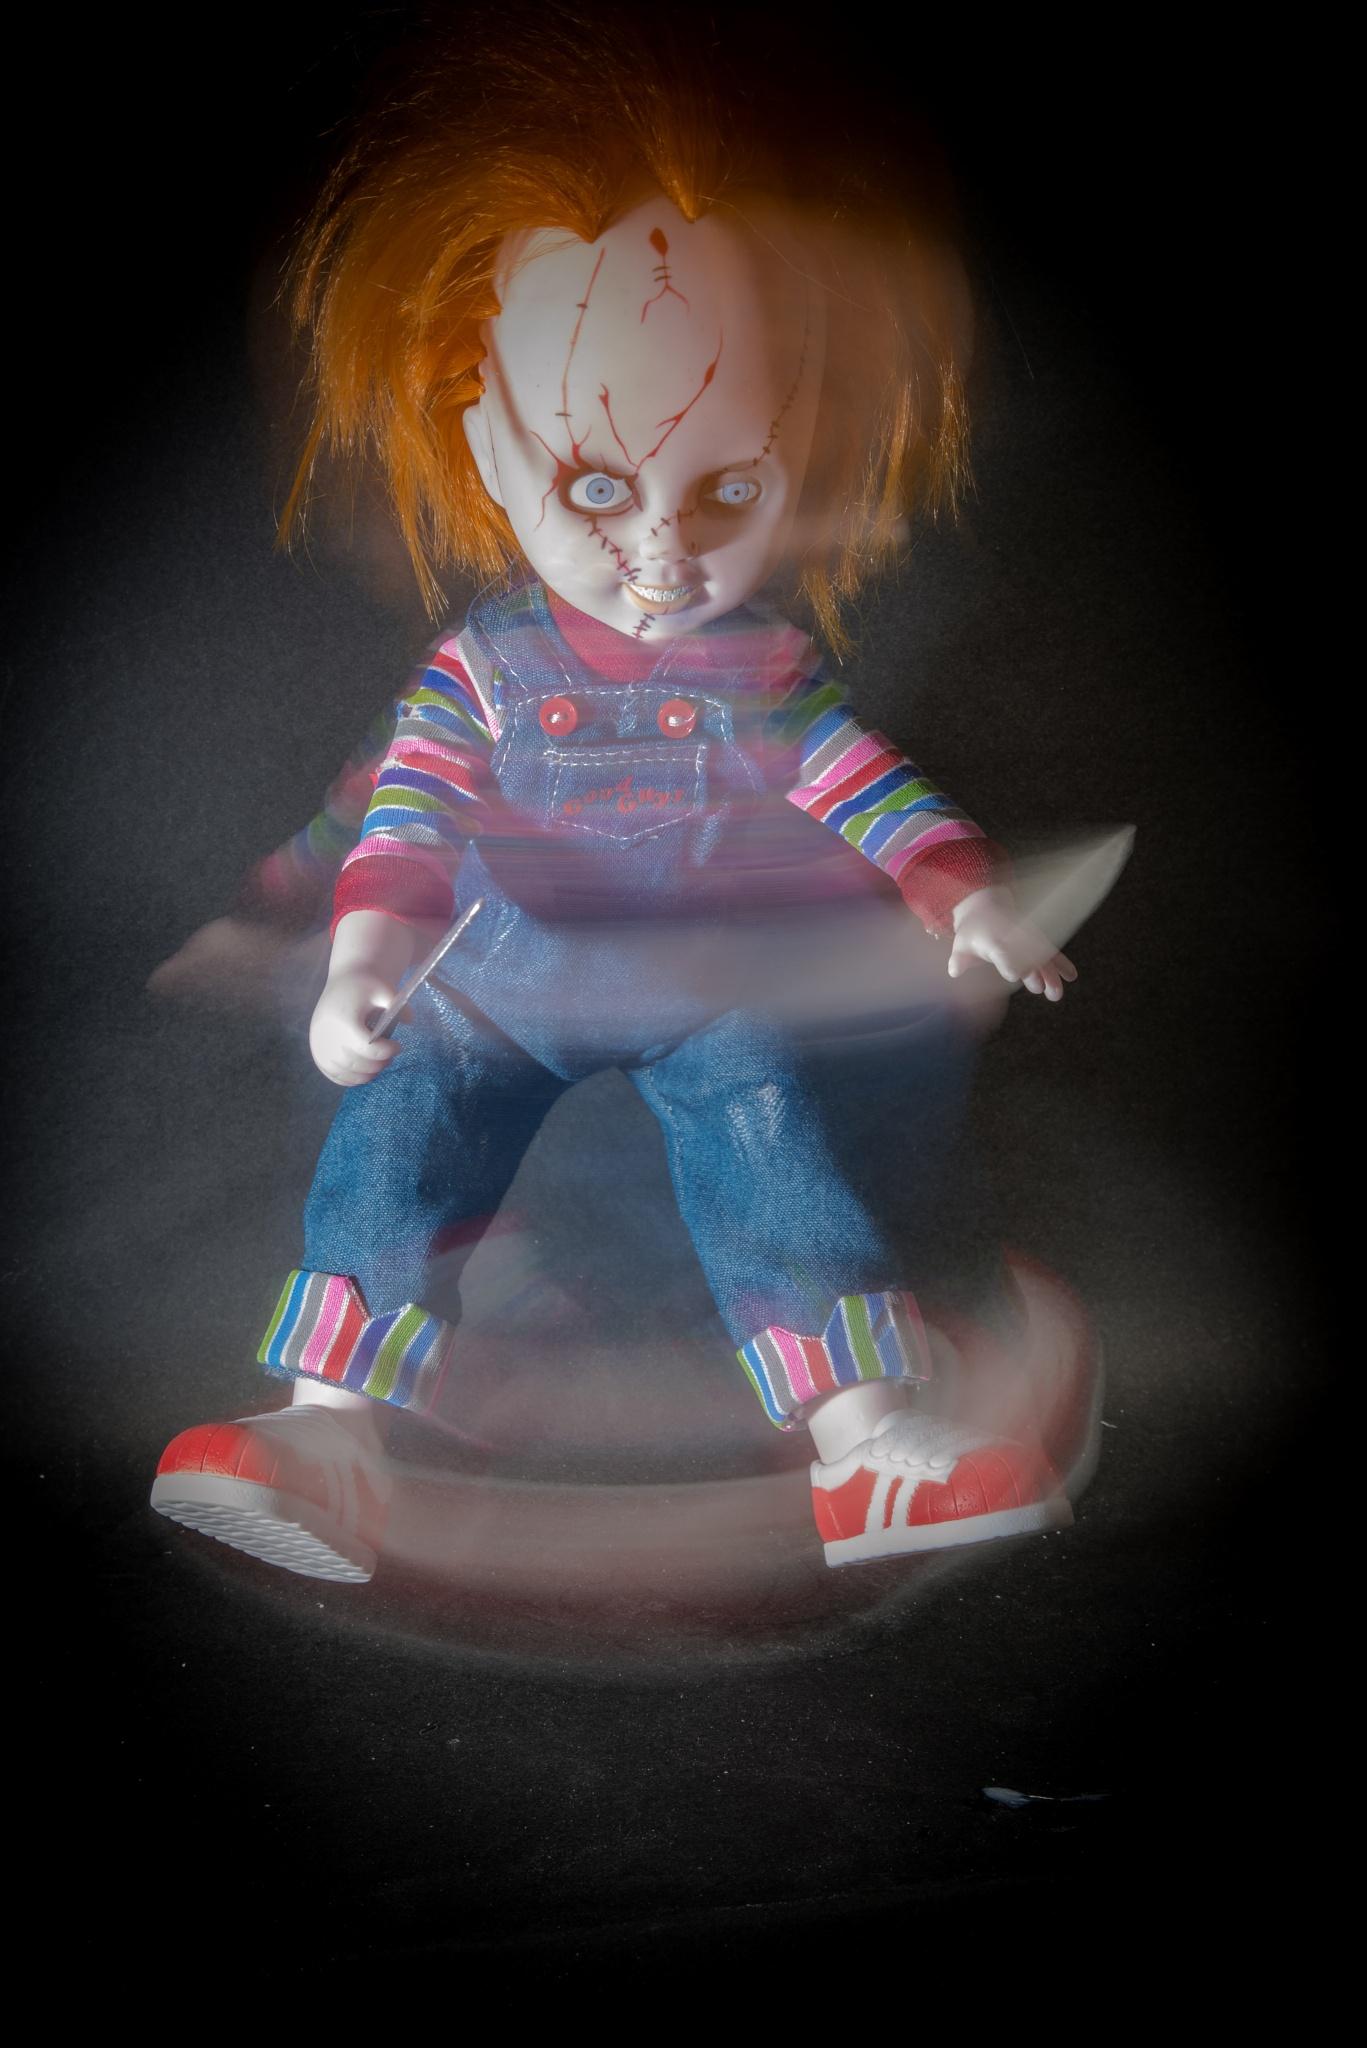 Chucky goes wild by larserik.keding